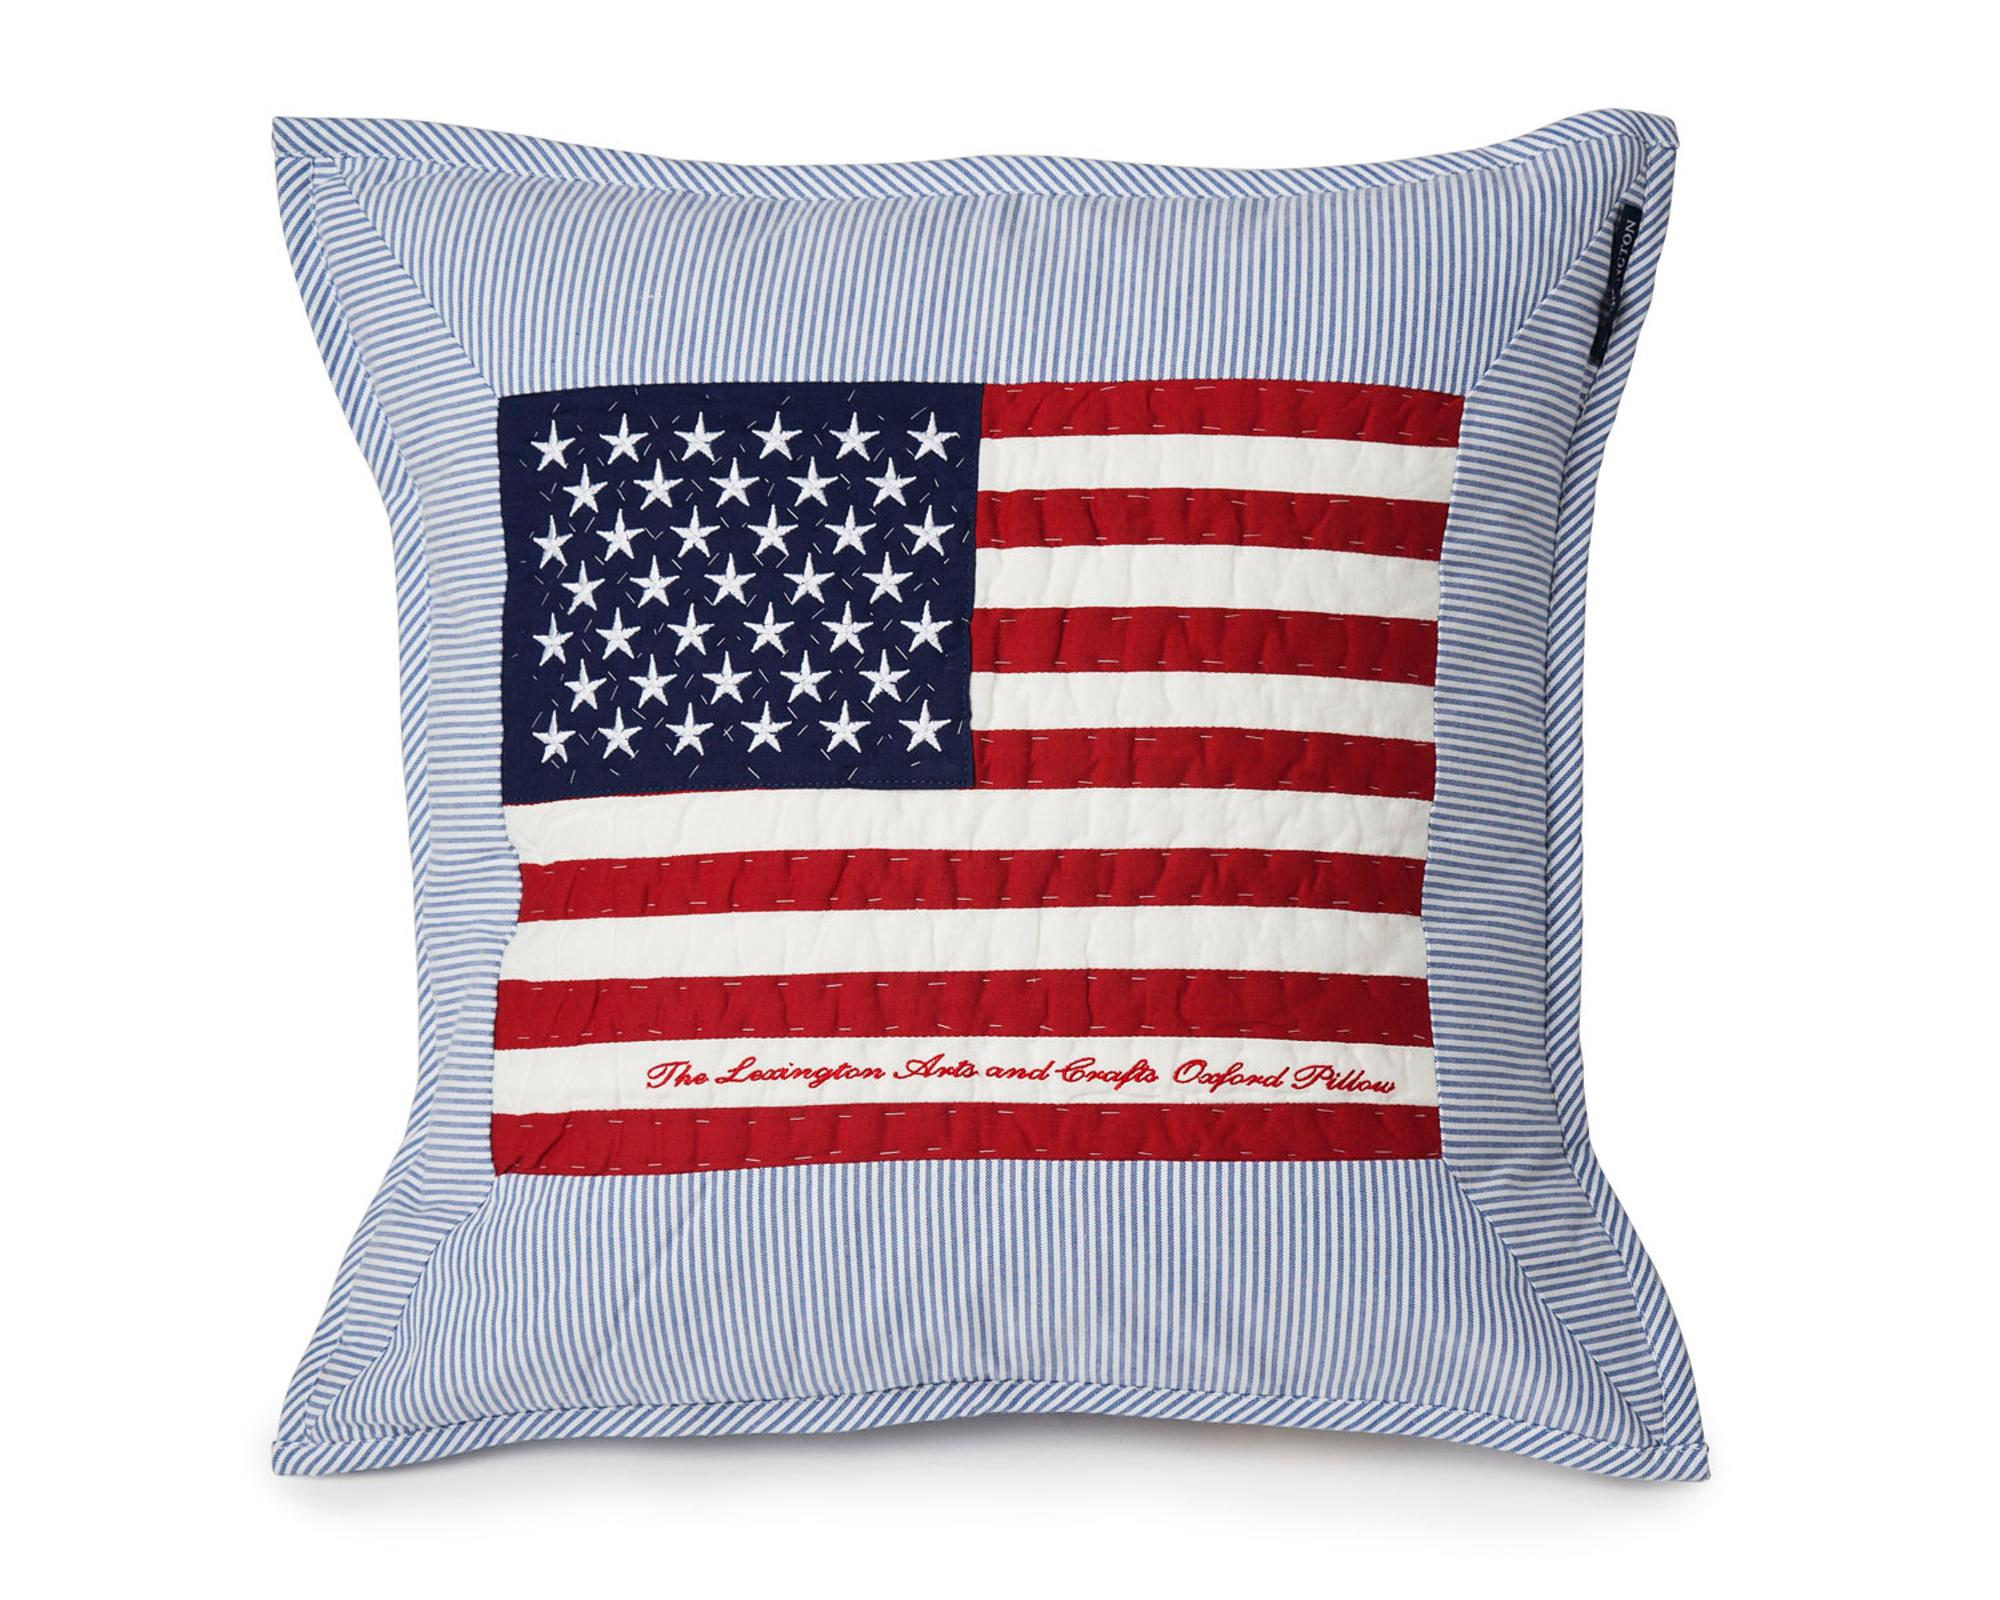 Arts and crafts pillows - Arts Crafts Sham